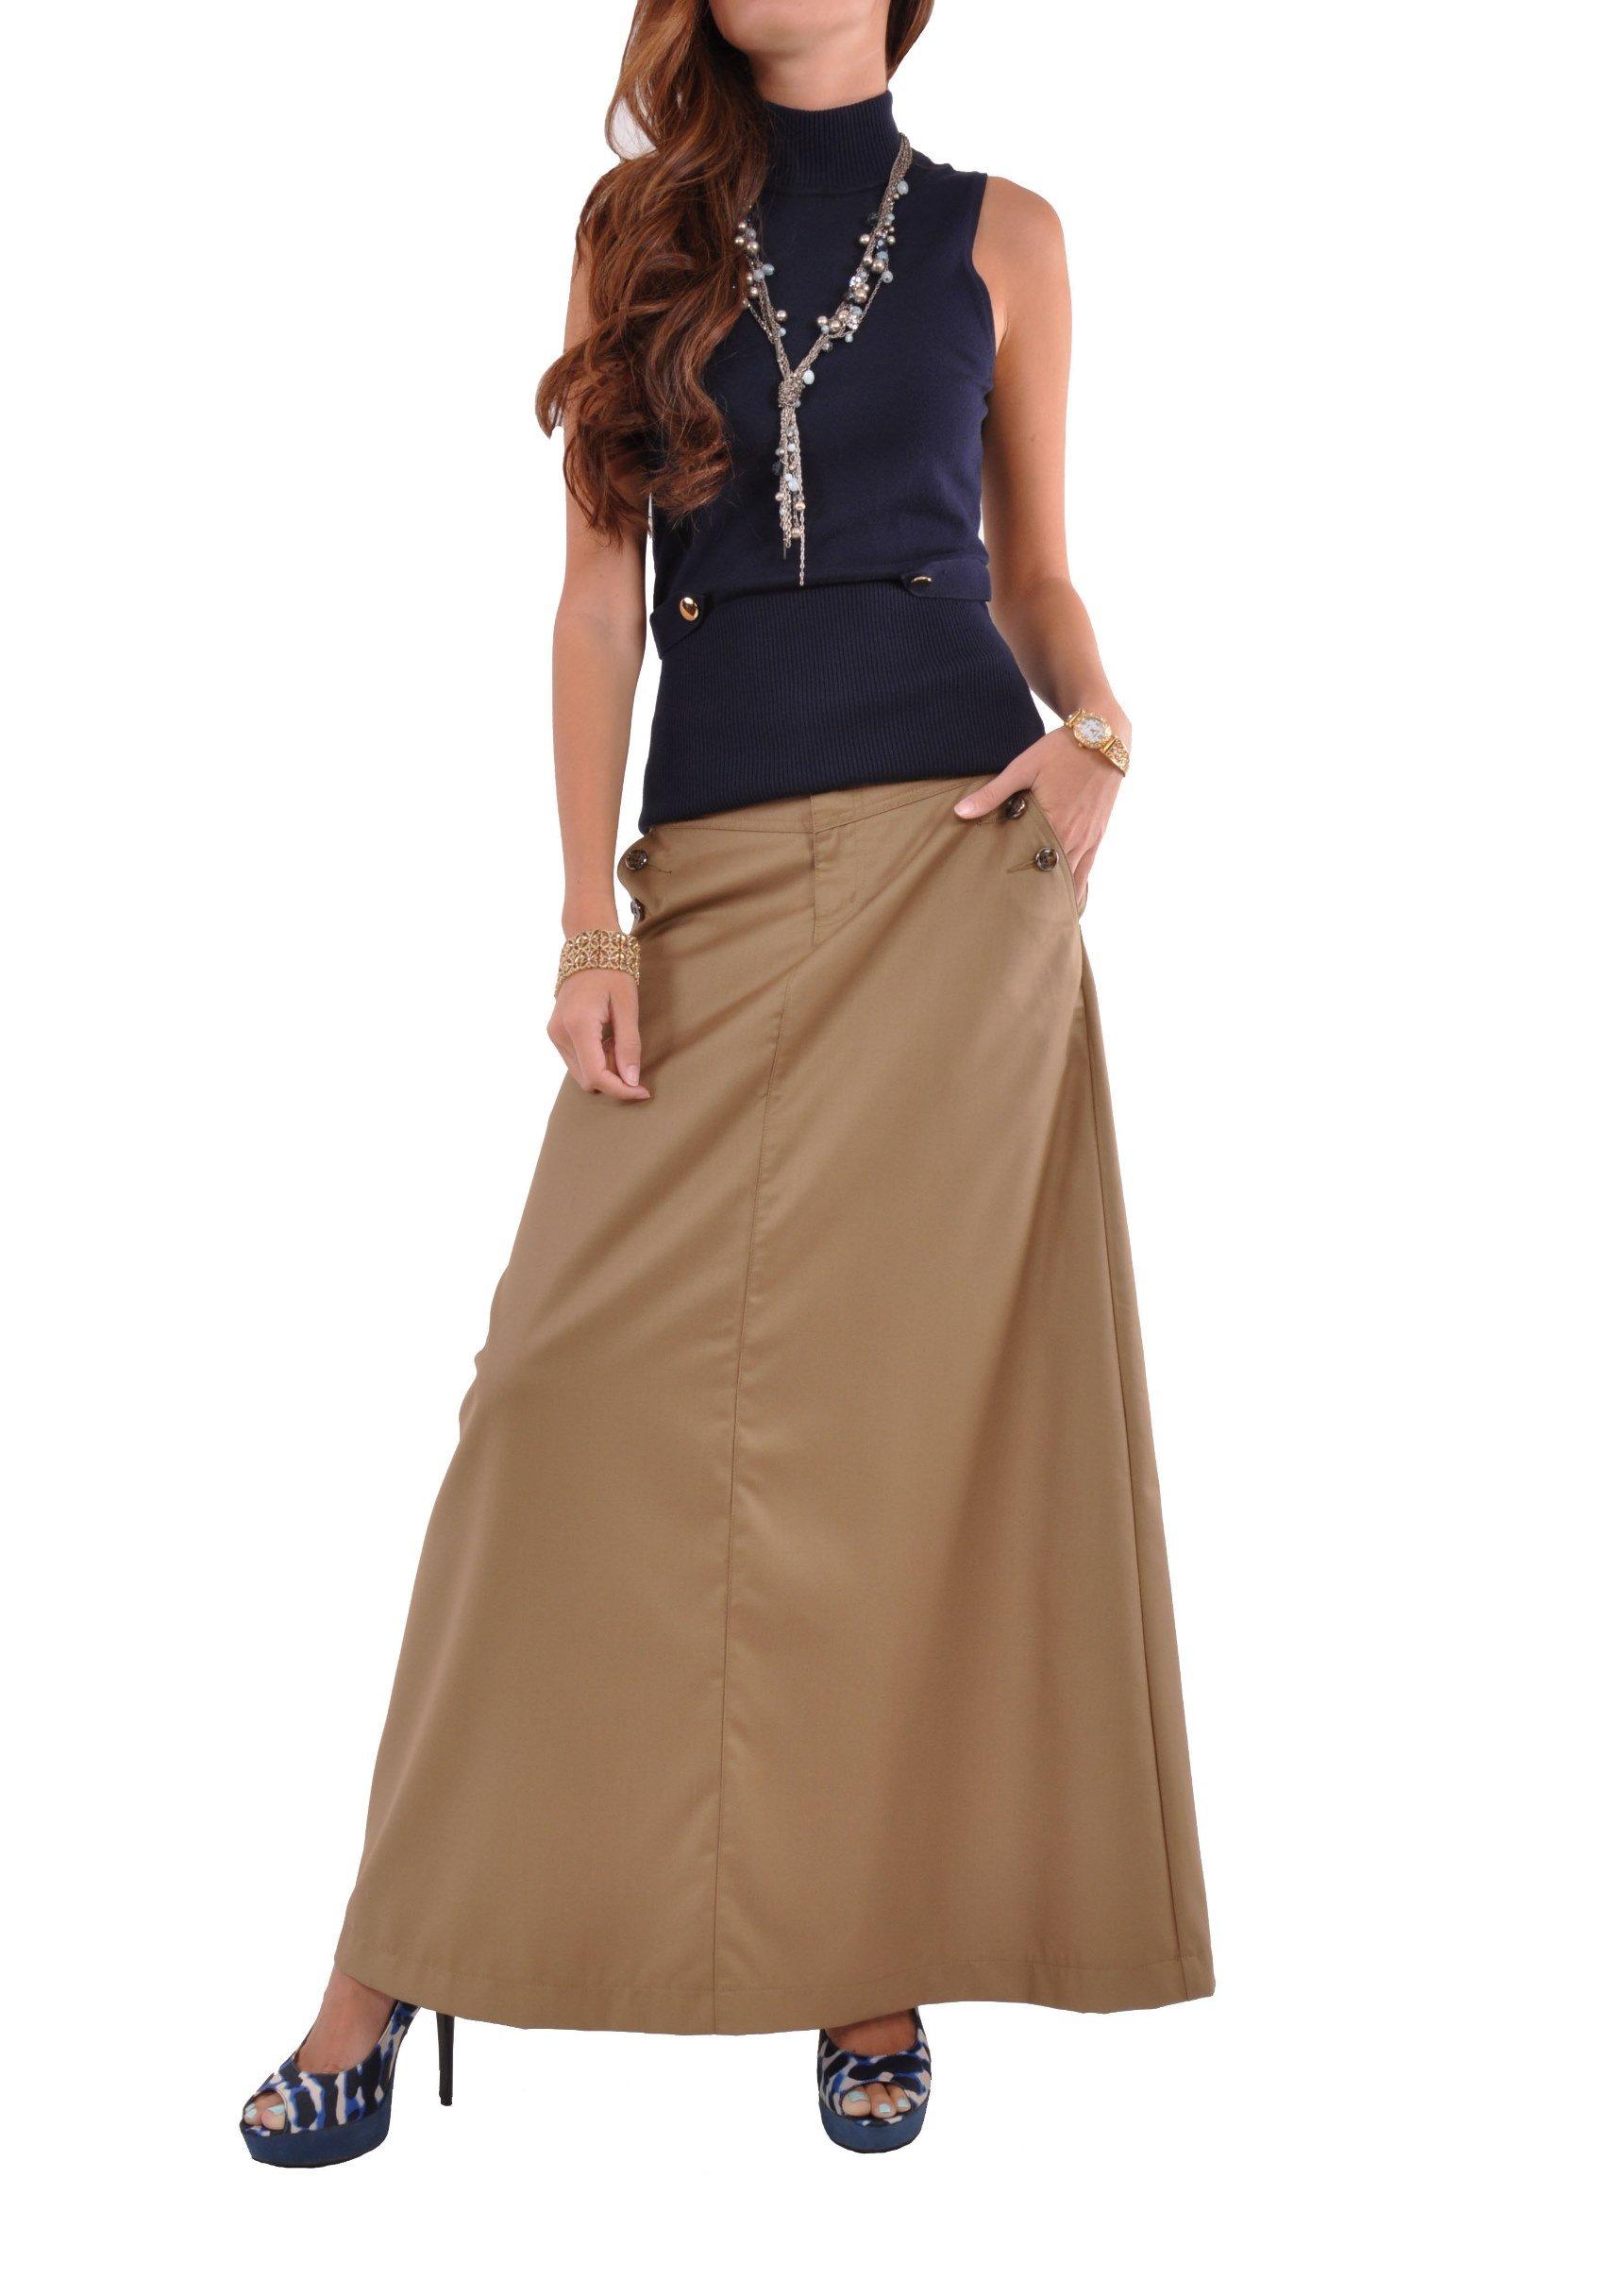 Style J Just Chic Khaki Long Skirt-Beige-34(14)